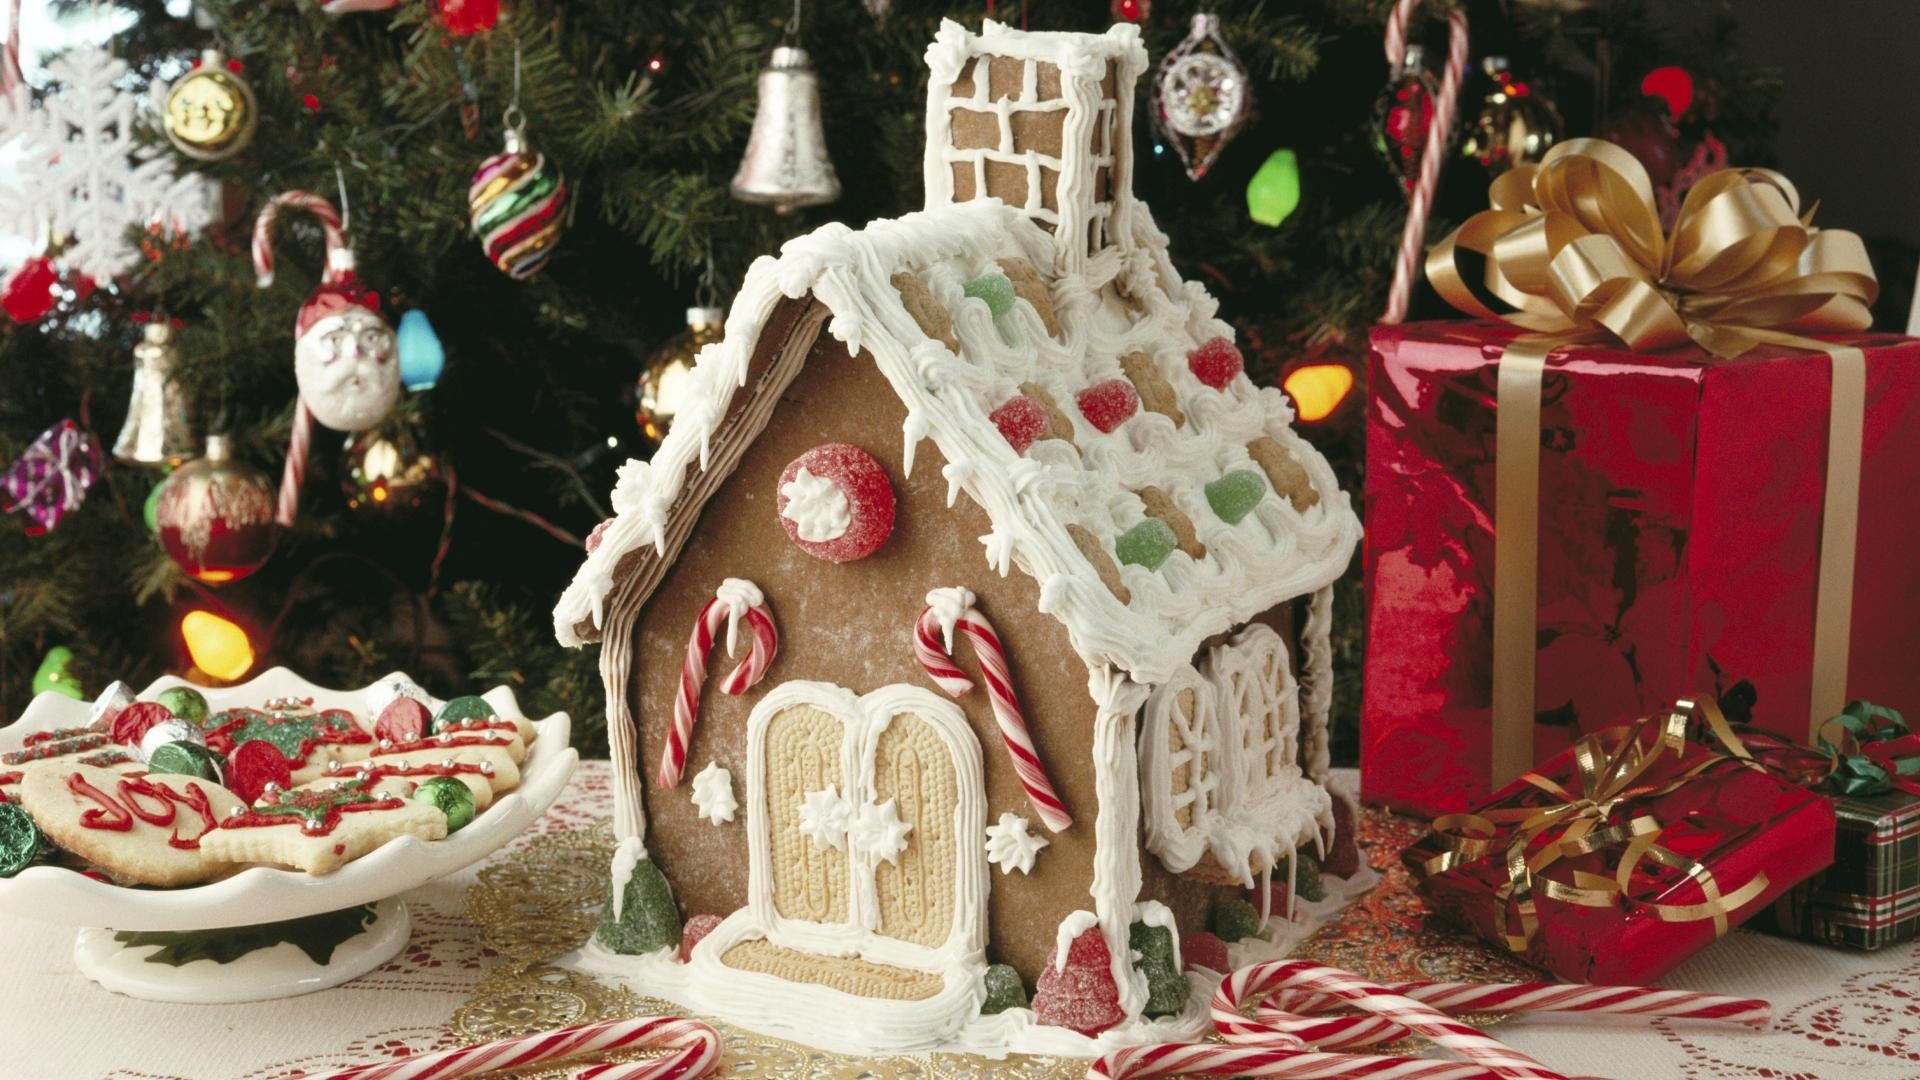 … Background Full HD 1080p. Wallpaper camping, food, sweet,  cookies, christmas